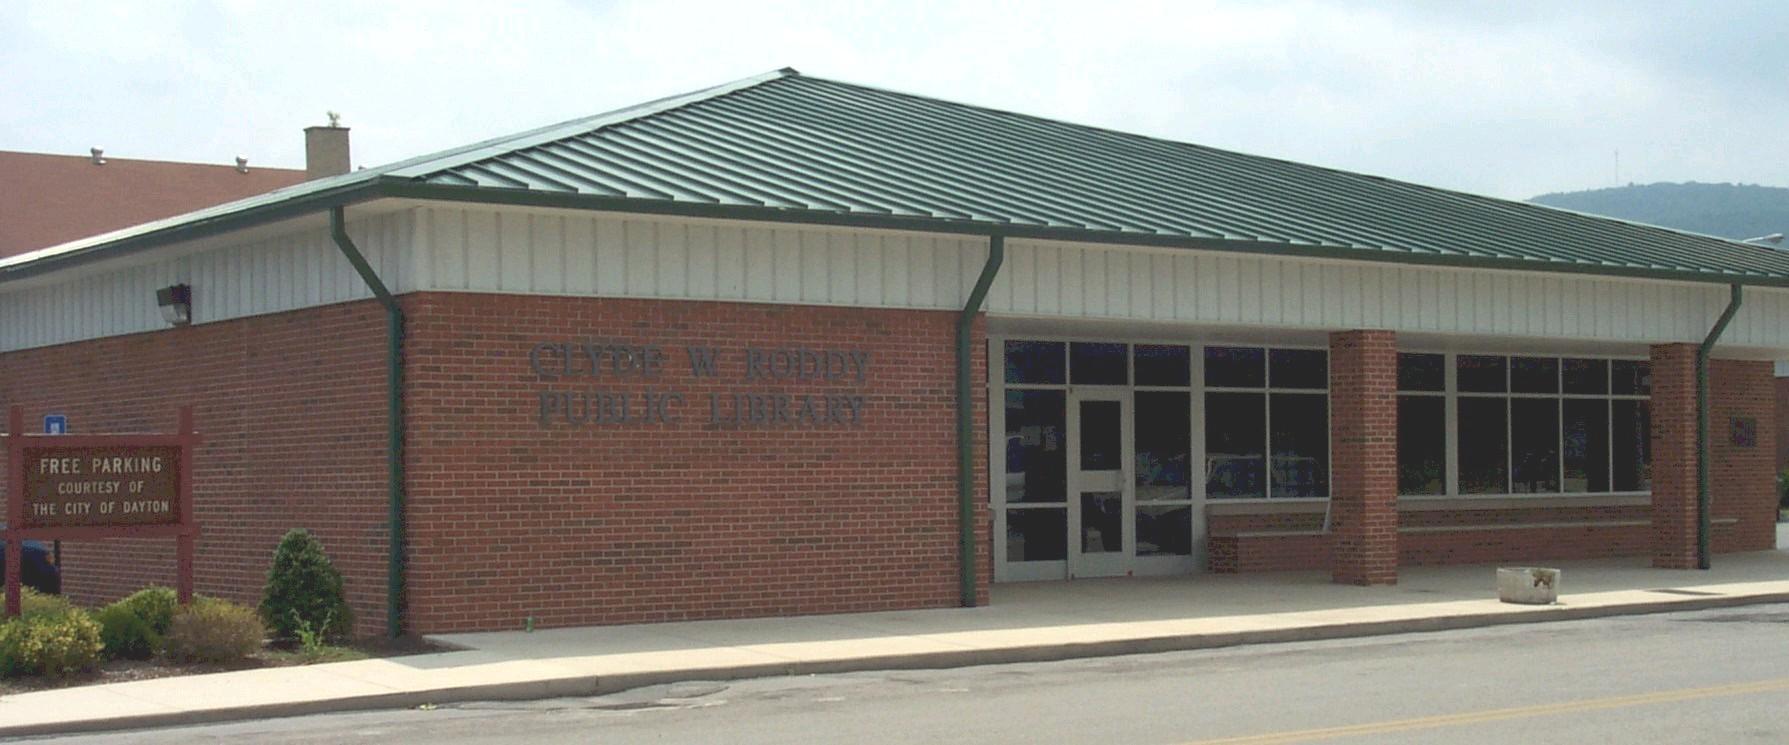 Clyde W. Roddy Public Library